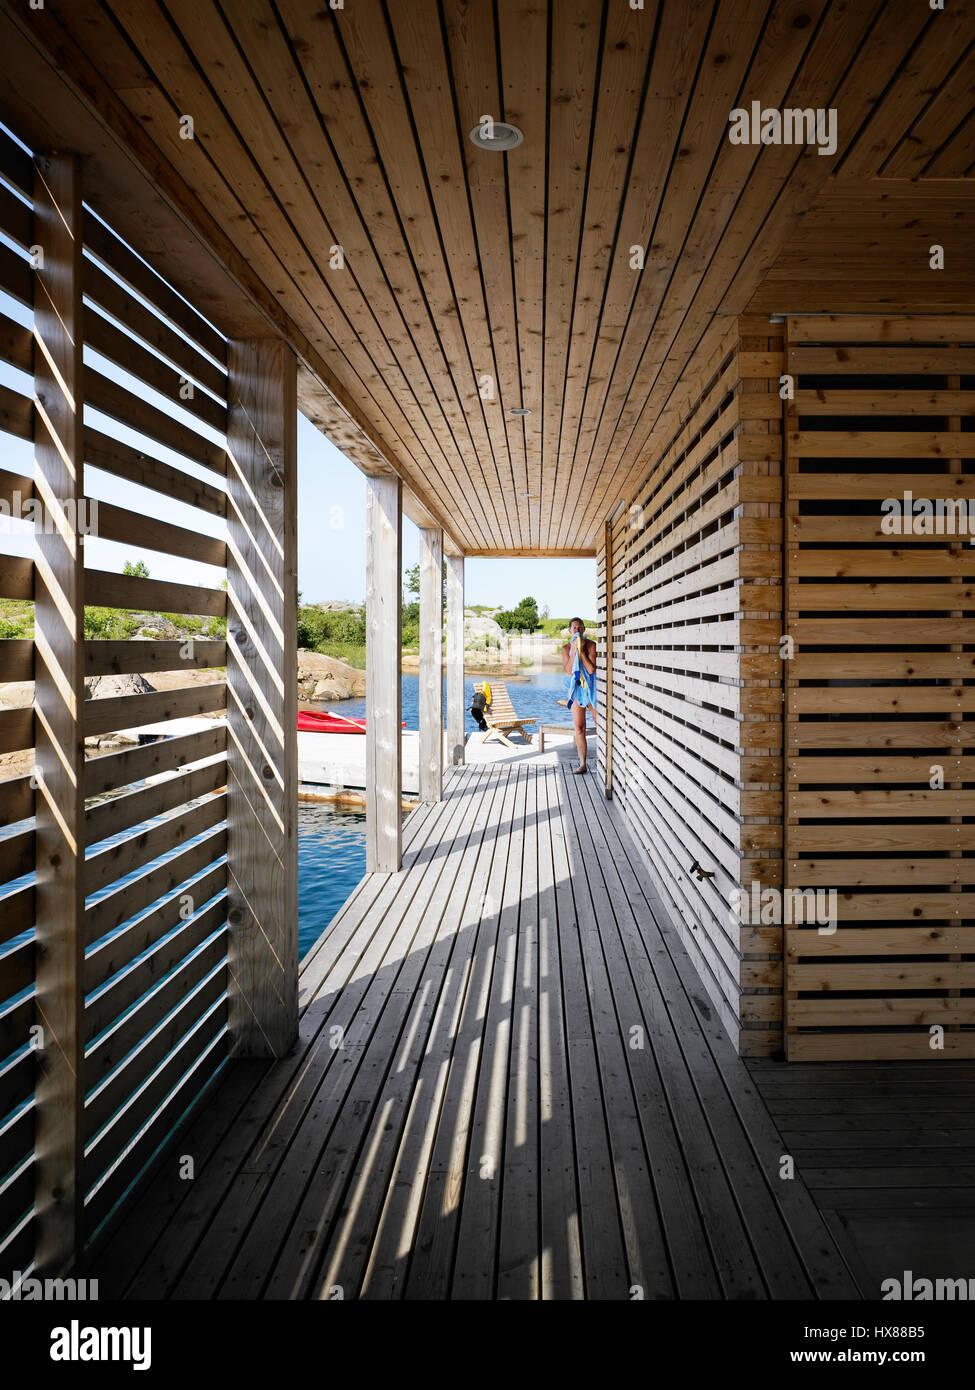 Cedar Siding In Lower Floor Outdoor Corridor Floating House